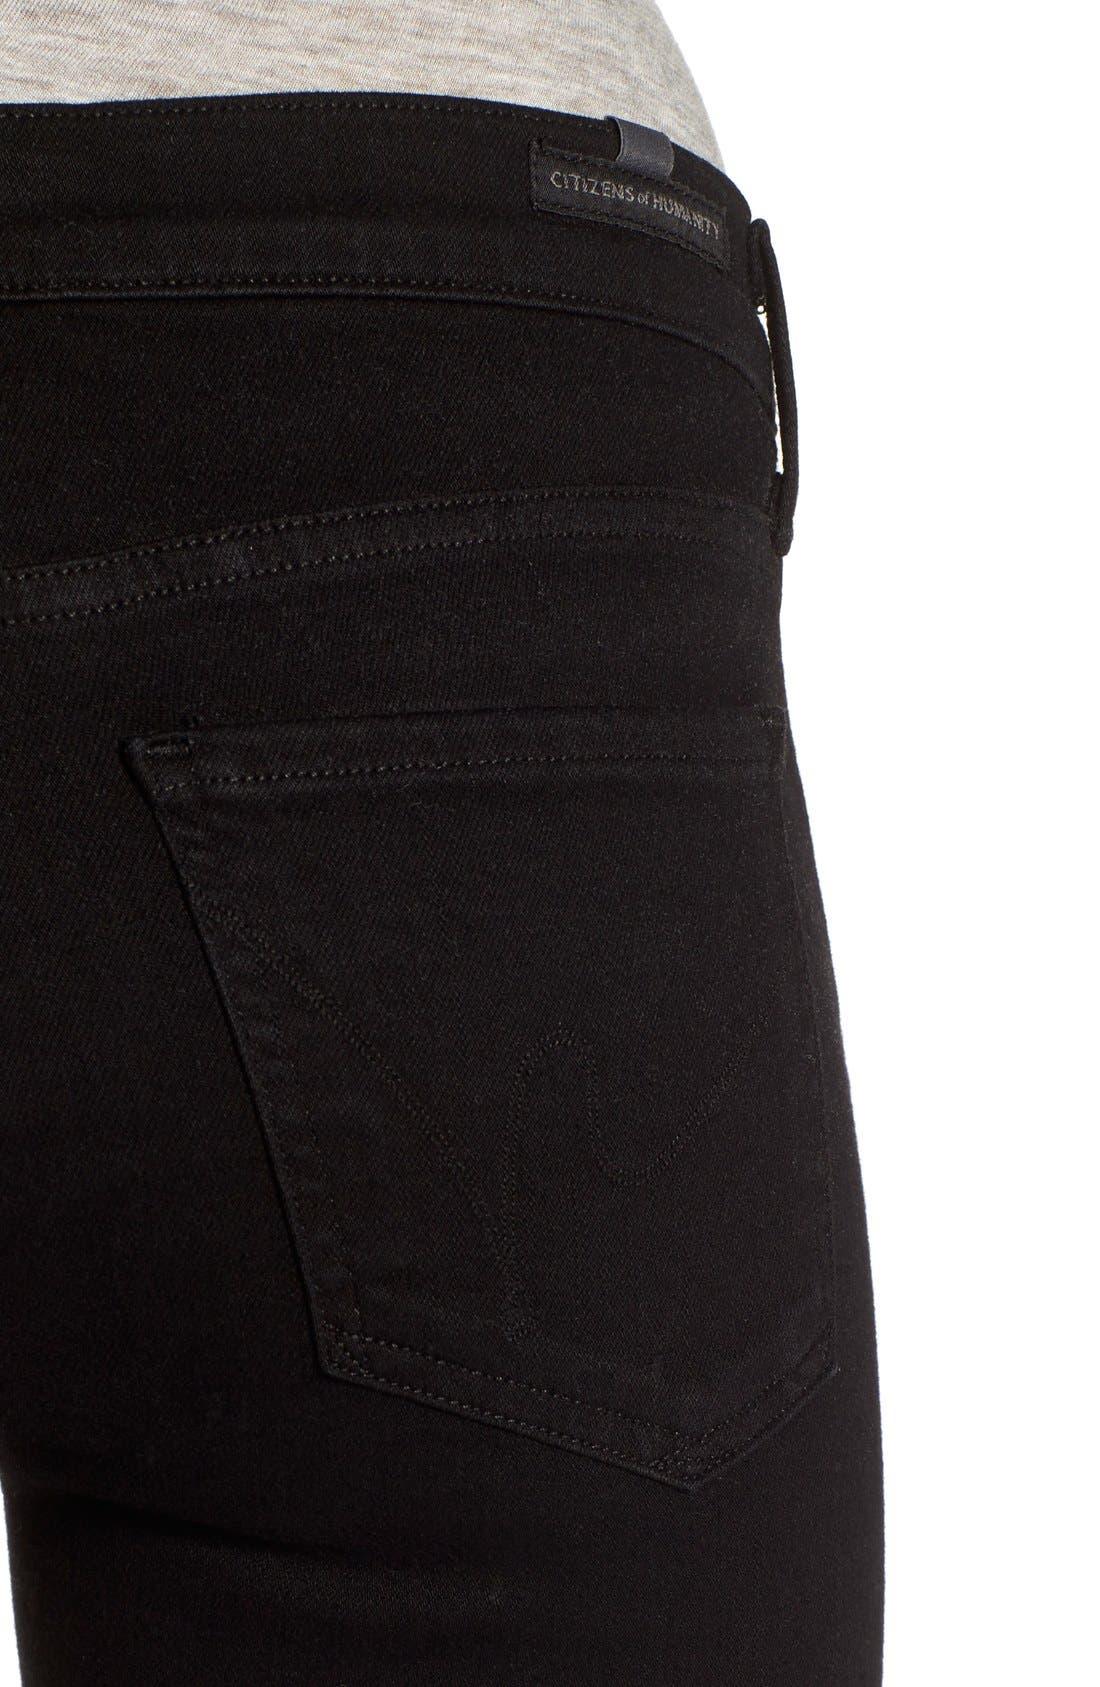 'Ava' Straight Leg Jeans,                             Alternate thumbnail 3, color,                             003